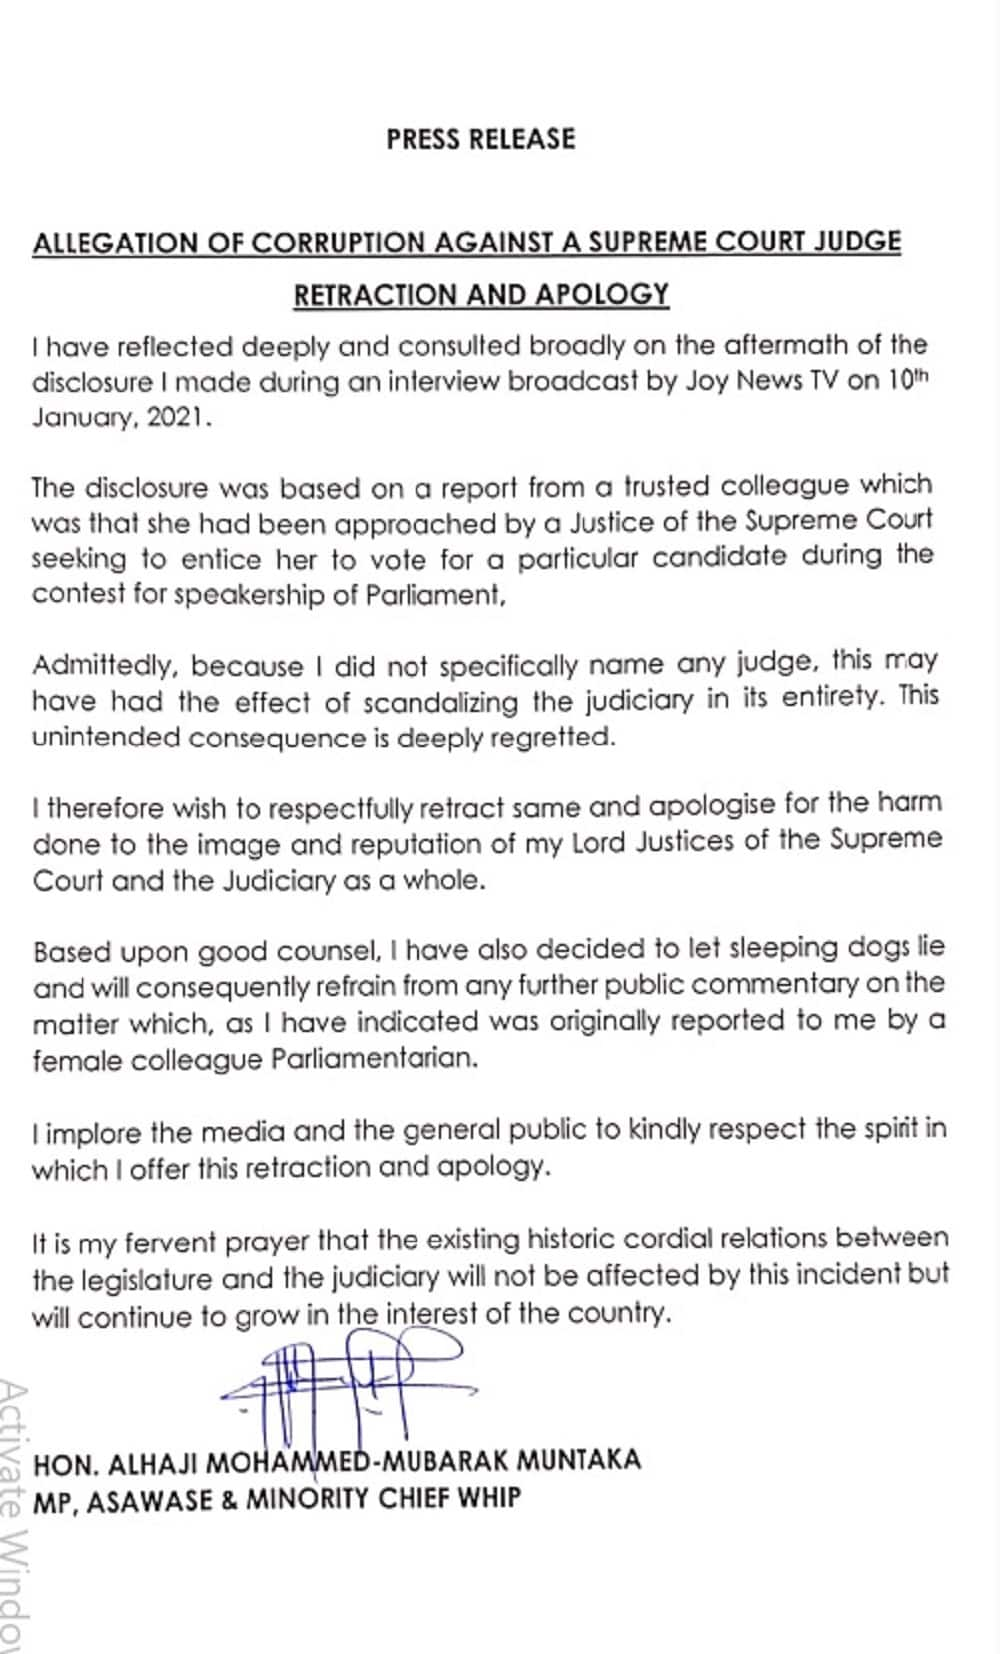 Muntaka Mubarak apologizes to Supreme Court over bribery claims